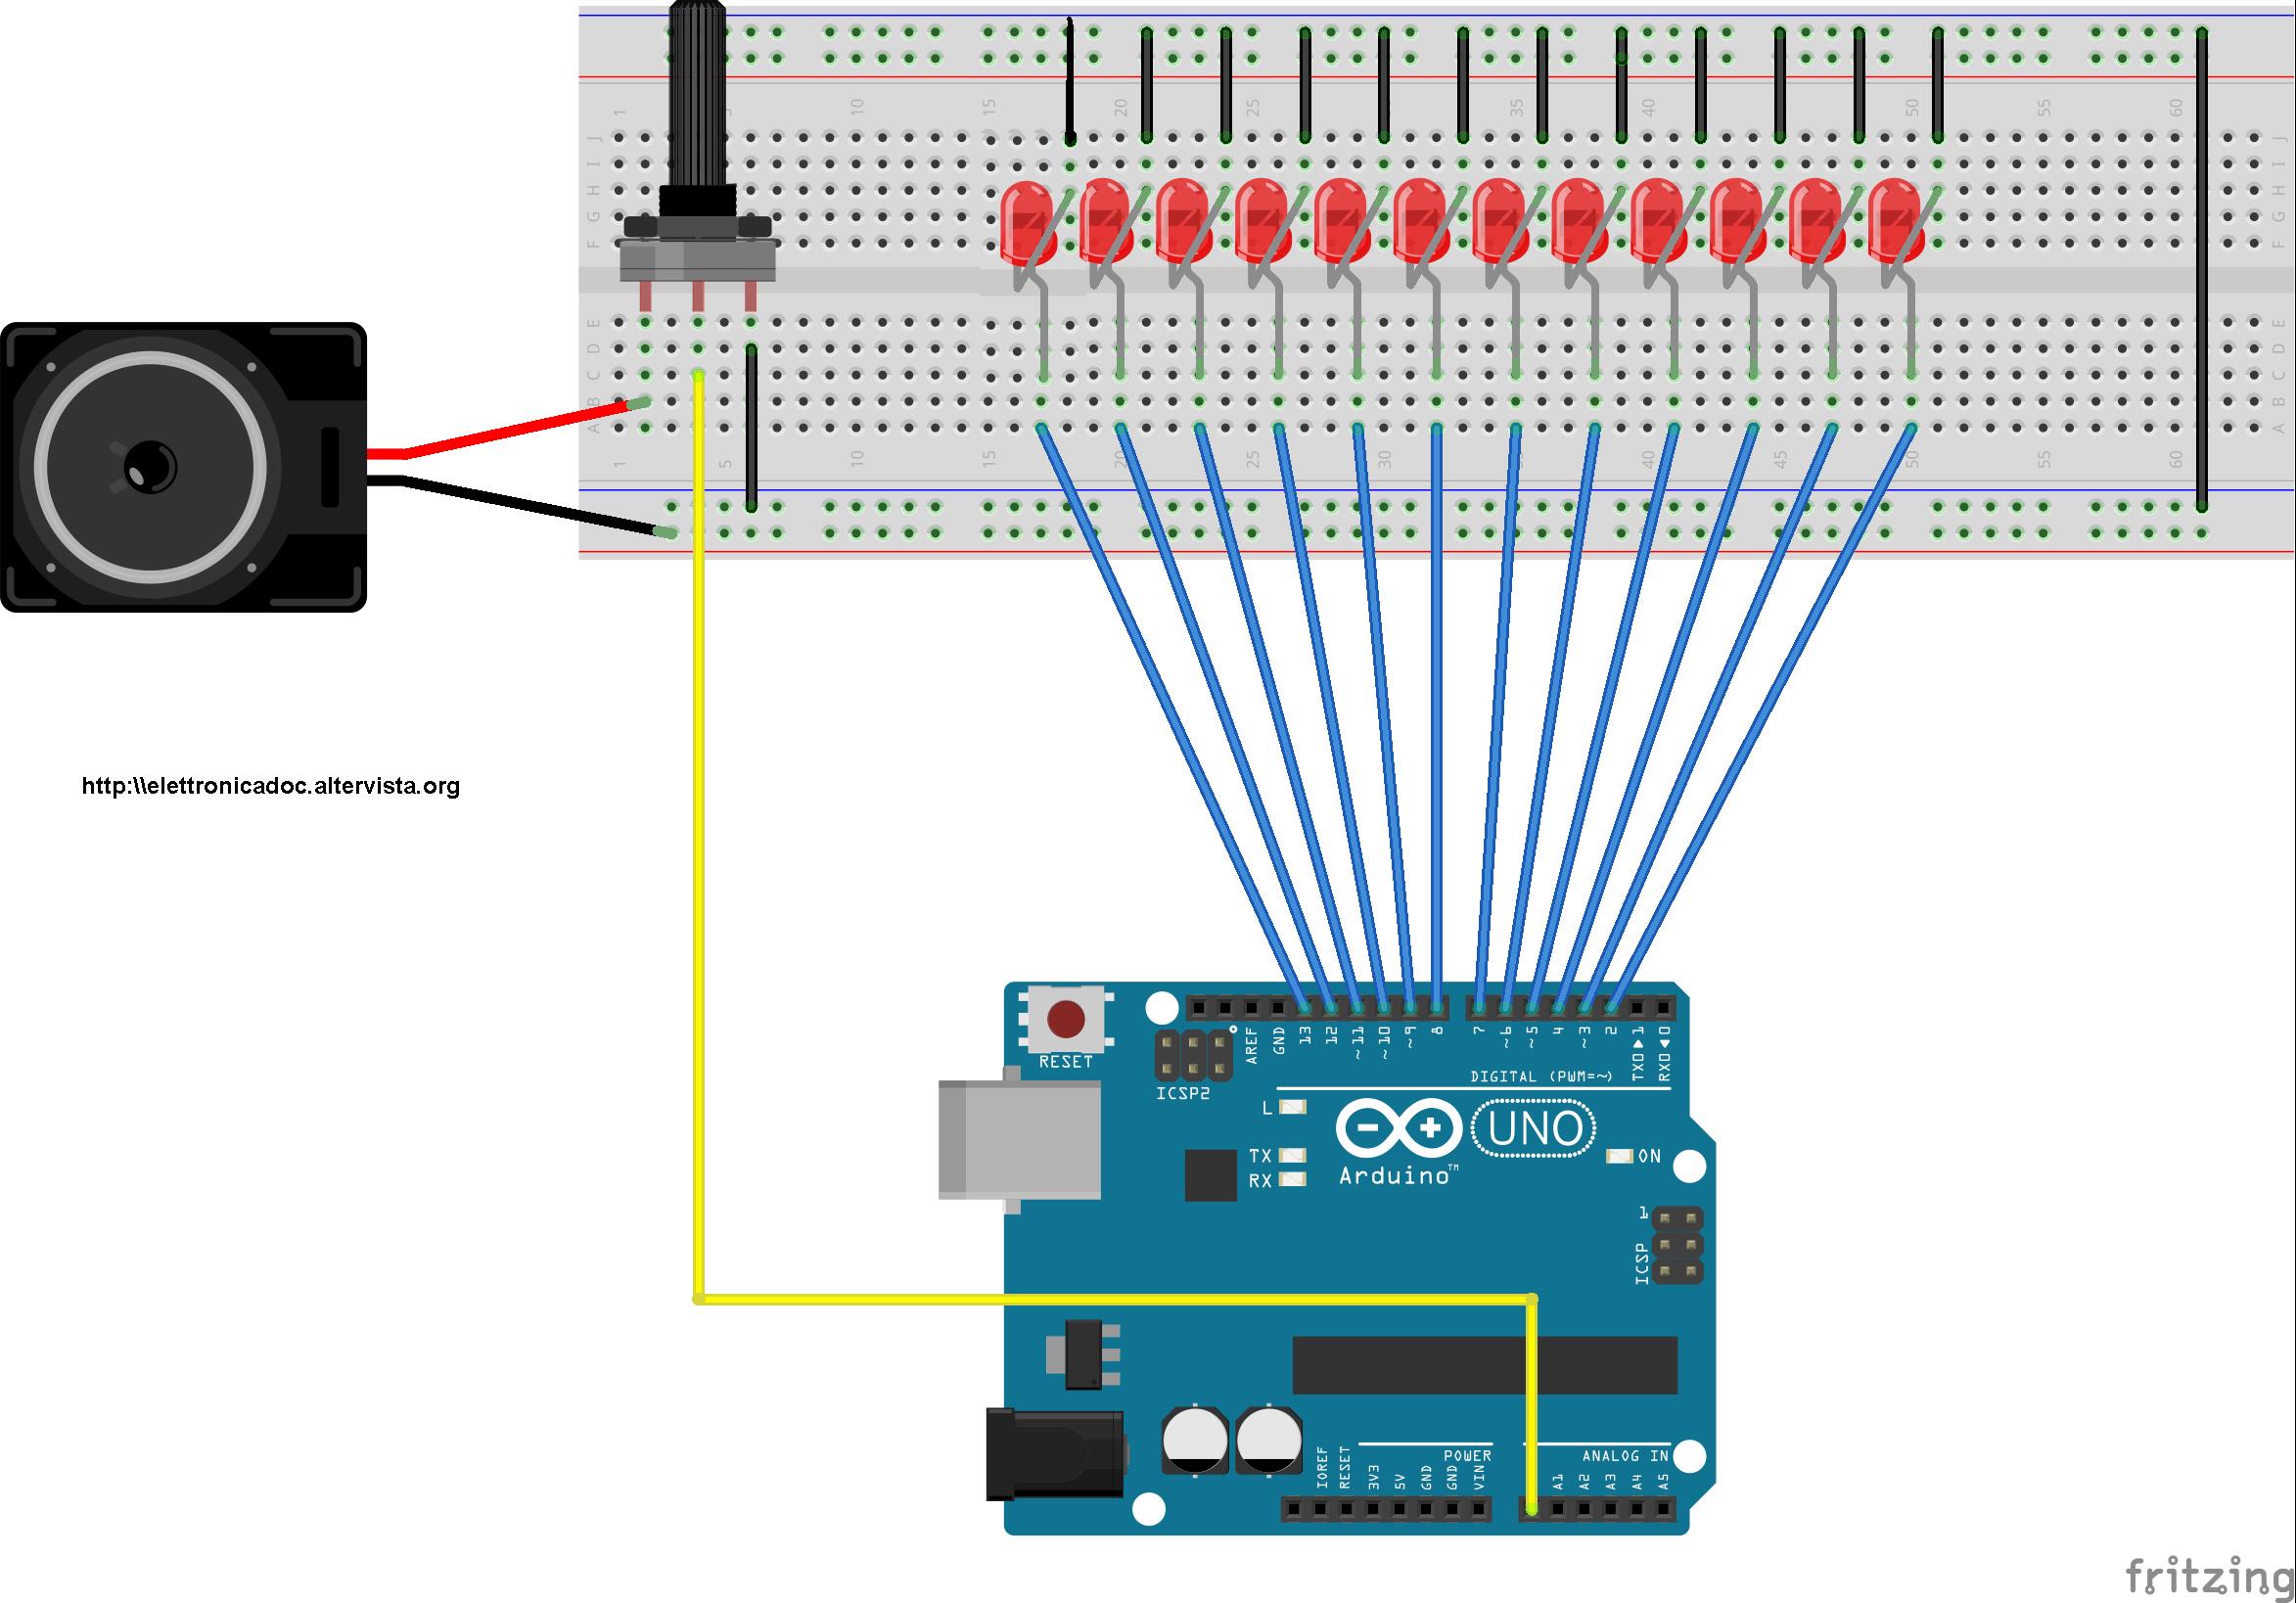 Roulette elettronica a led schema